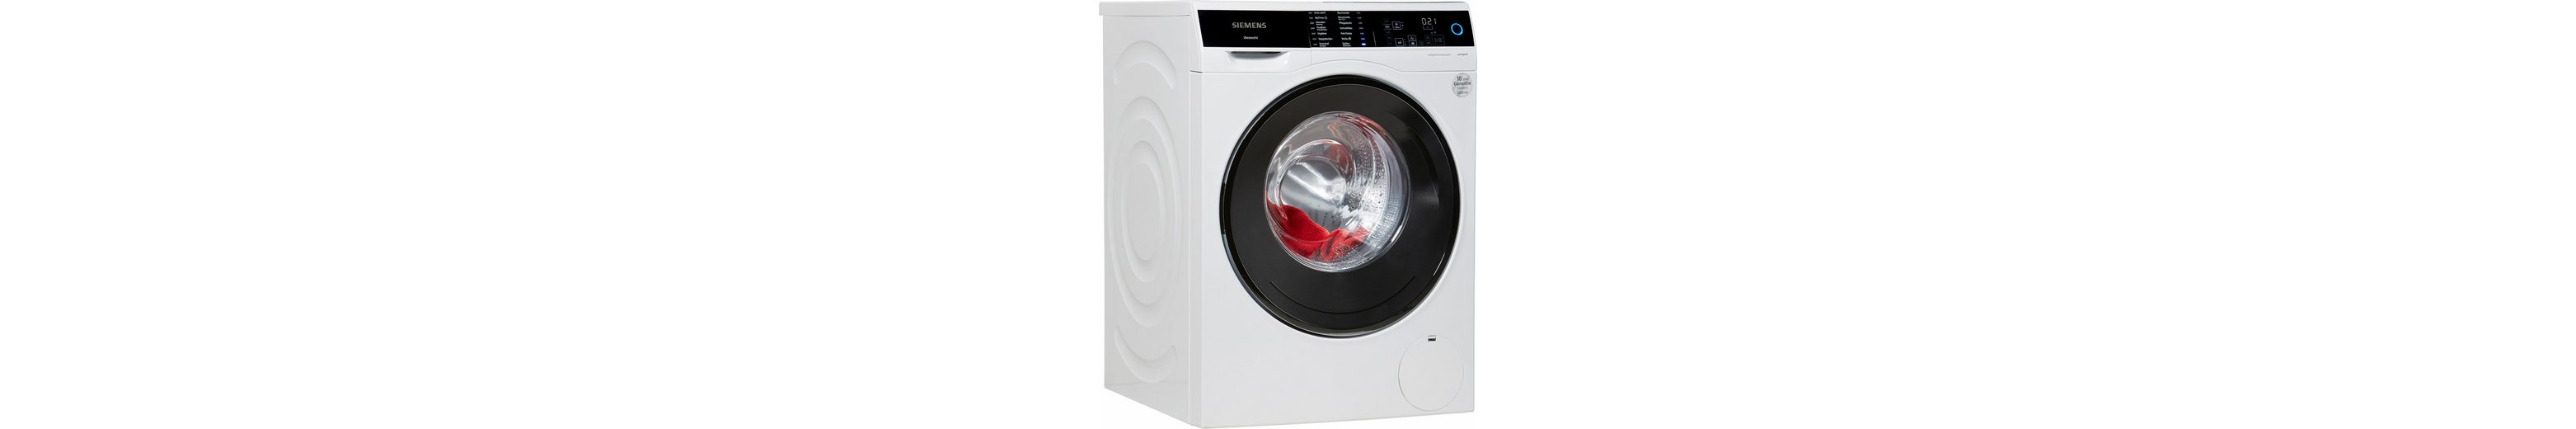 SIEMENS Waschmaschine WM14U640, A+++, 9 kg, 1400 U/Min